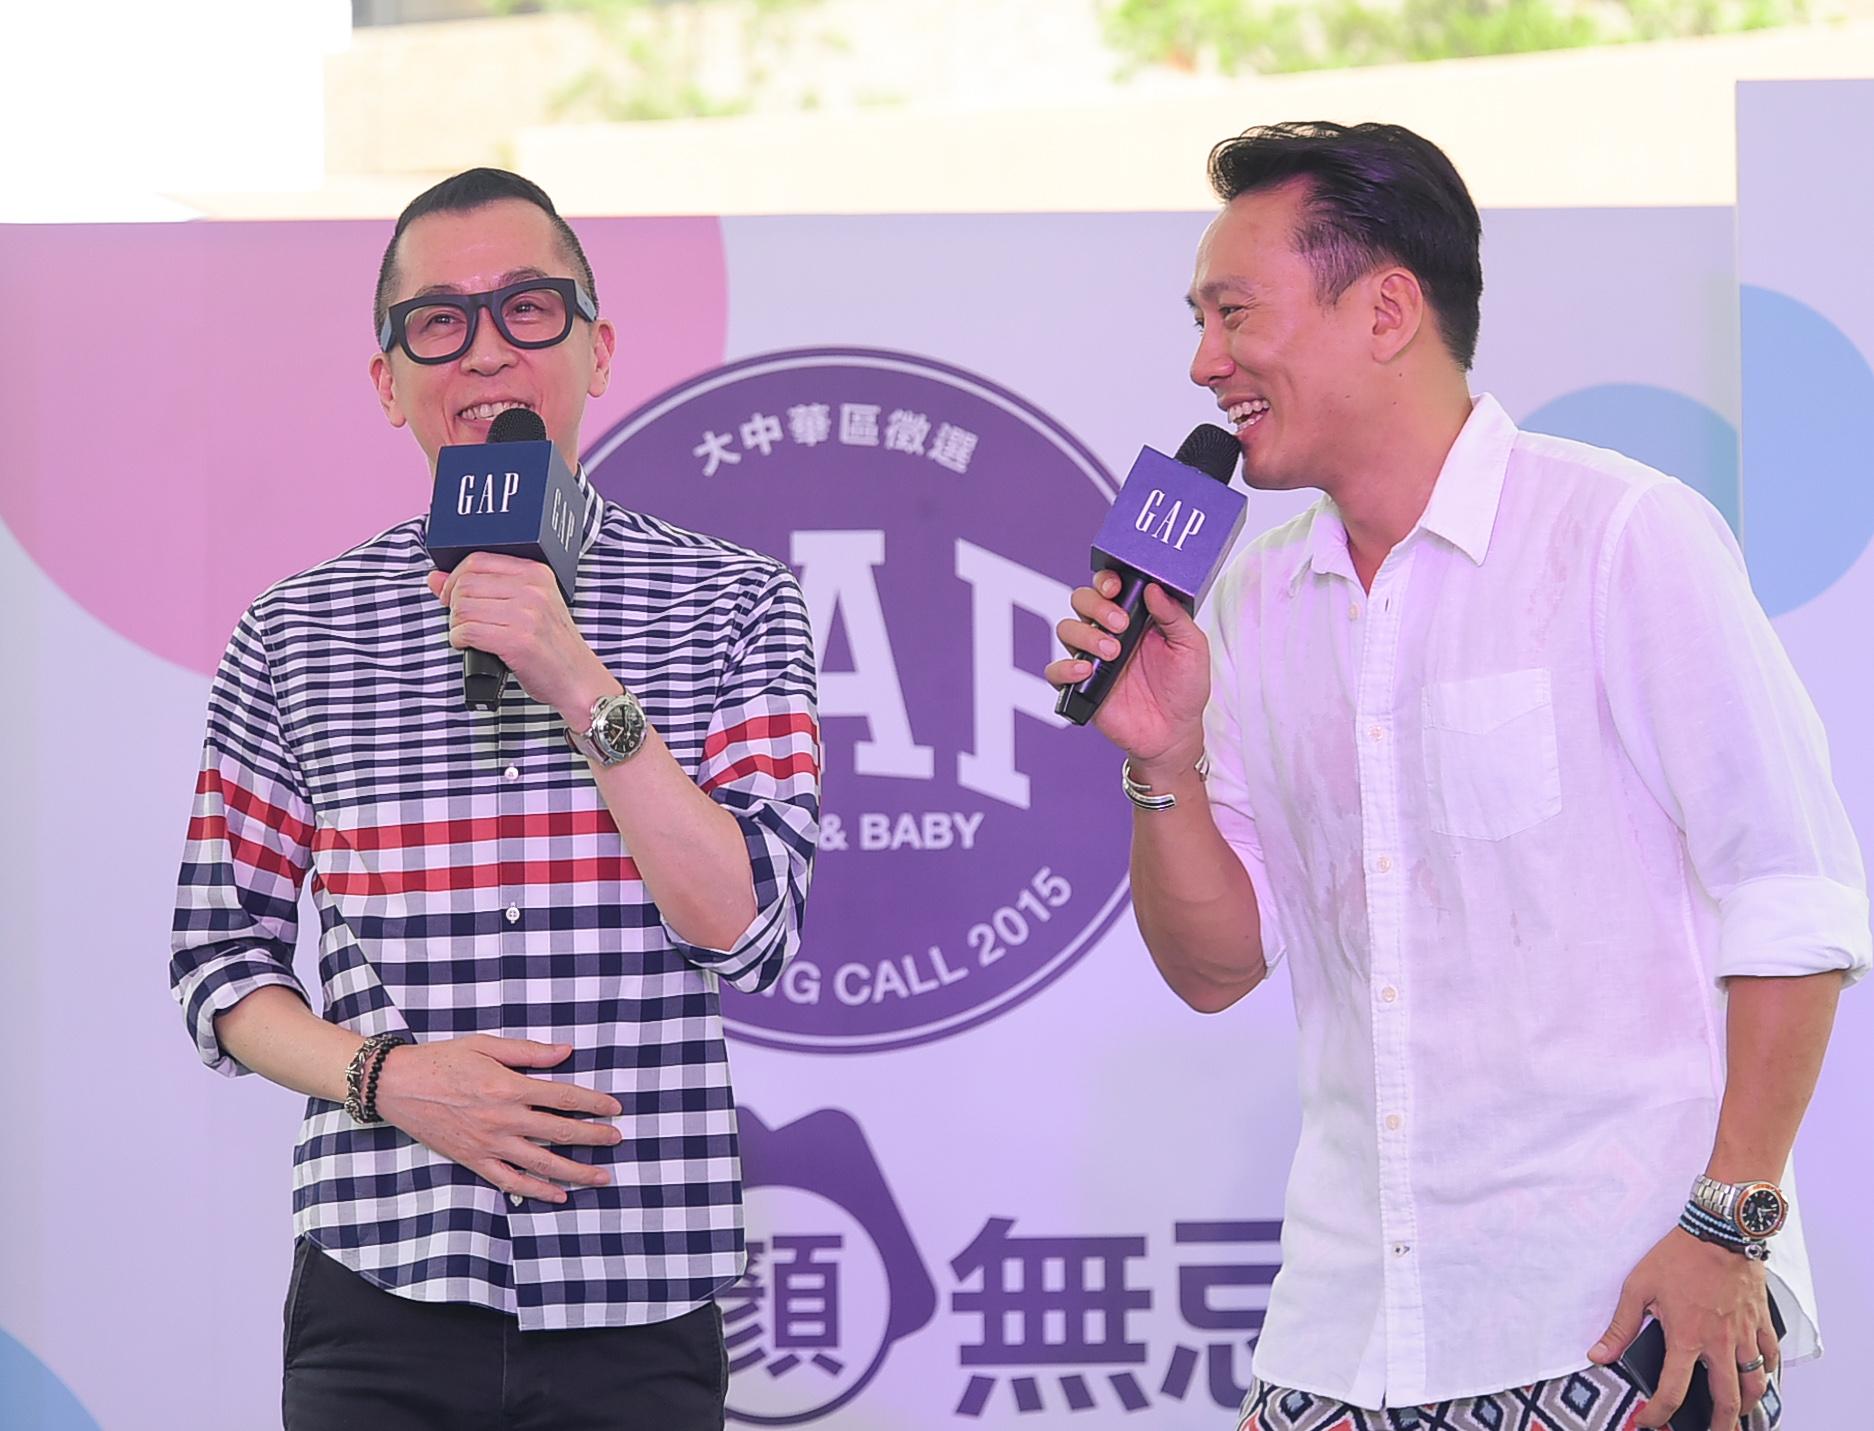 Gap Casting Call全球小小代言人征選大中華區活動台北站巡演特邀艾力克斯擔任主持,Roger鄭健國老師為小小模特打造夏日造型